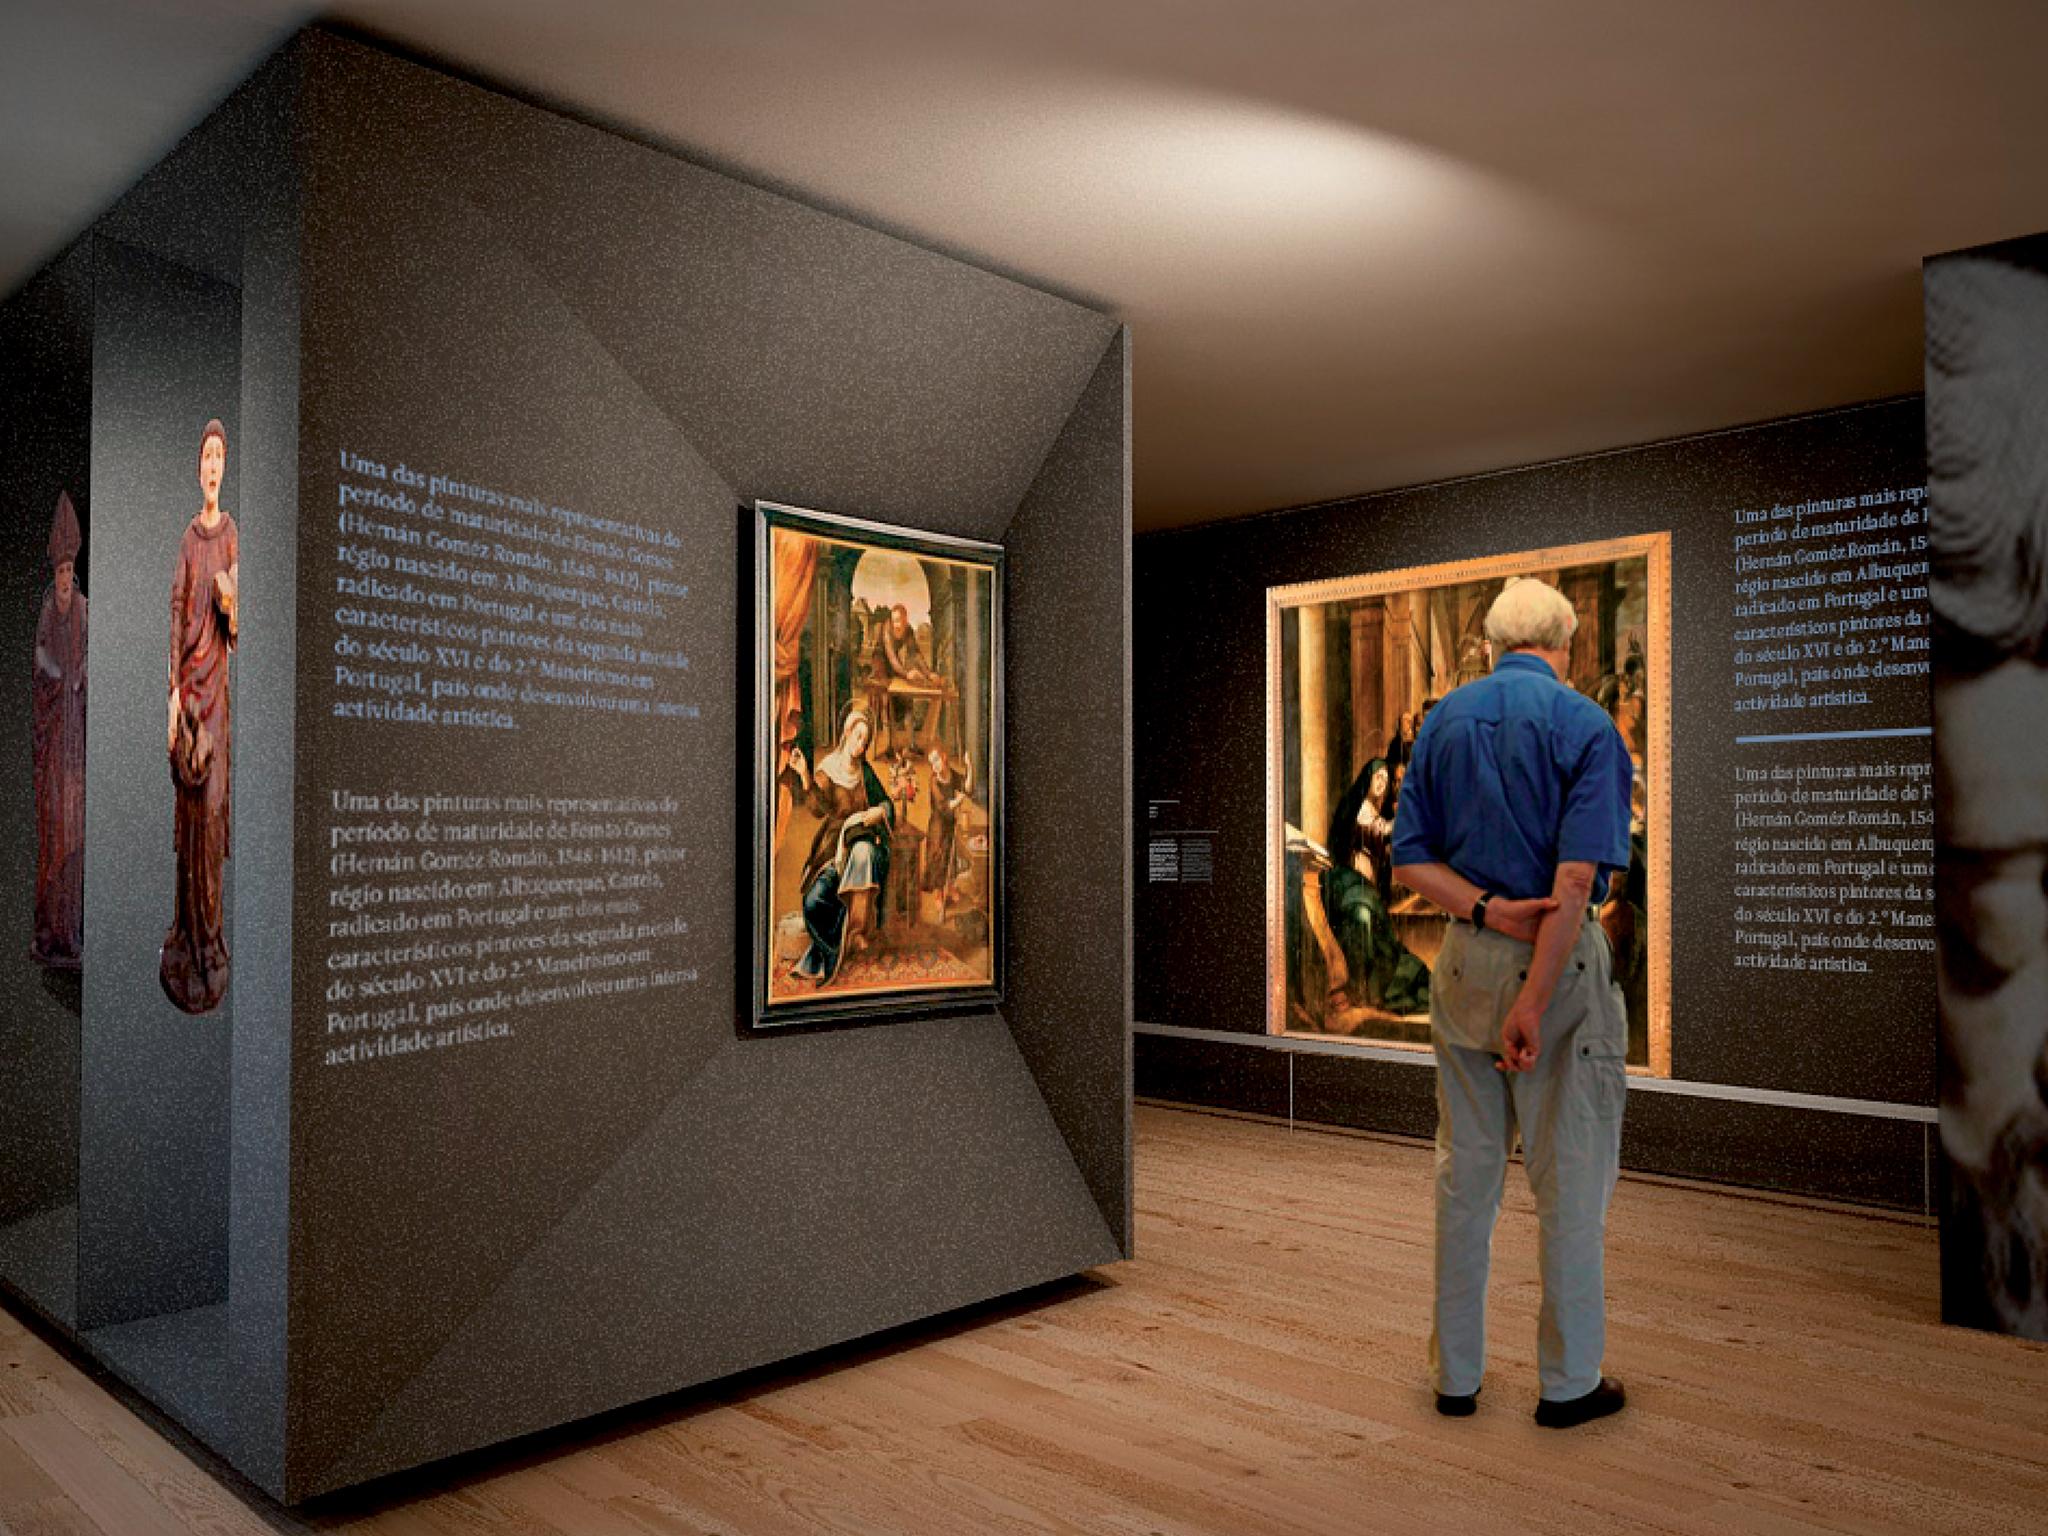 Núcleo Museológico da Santa Casa da Misericórdia